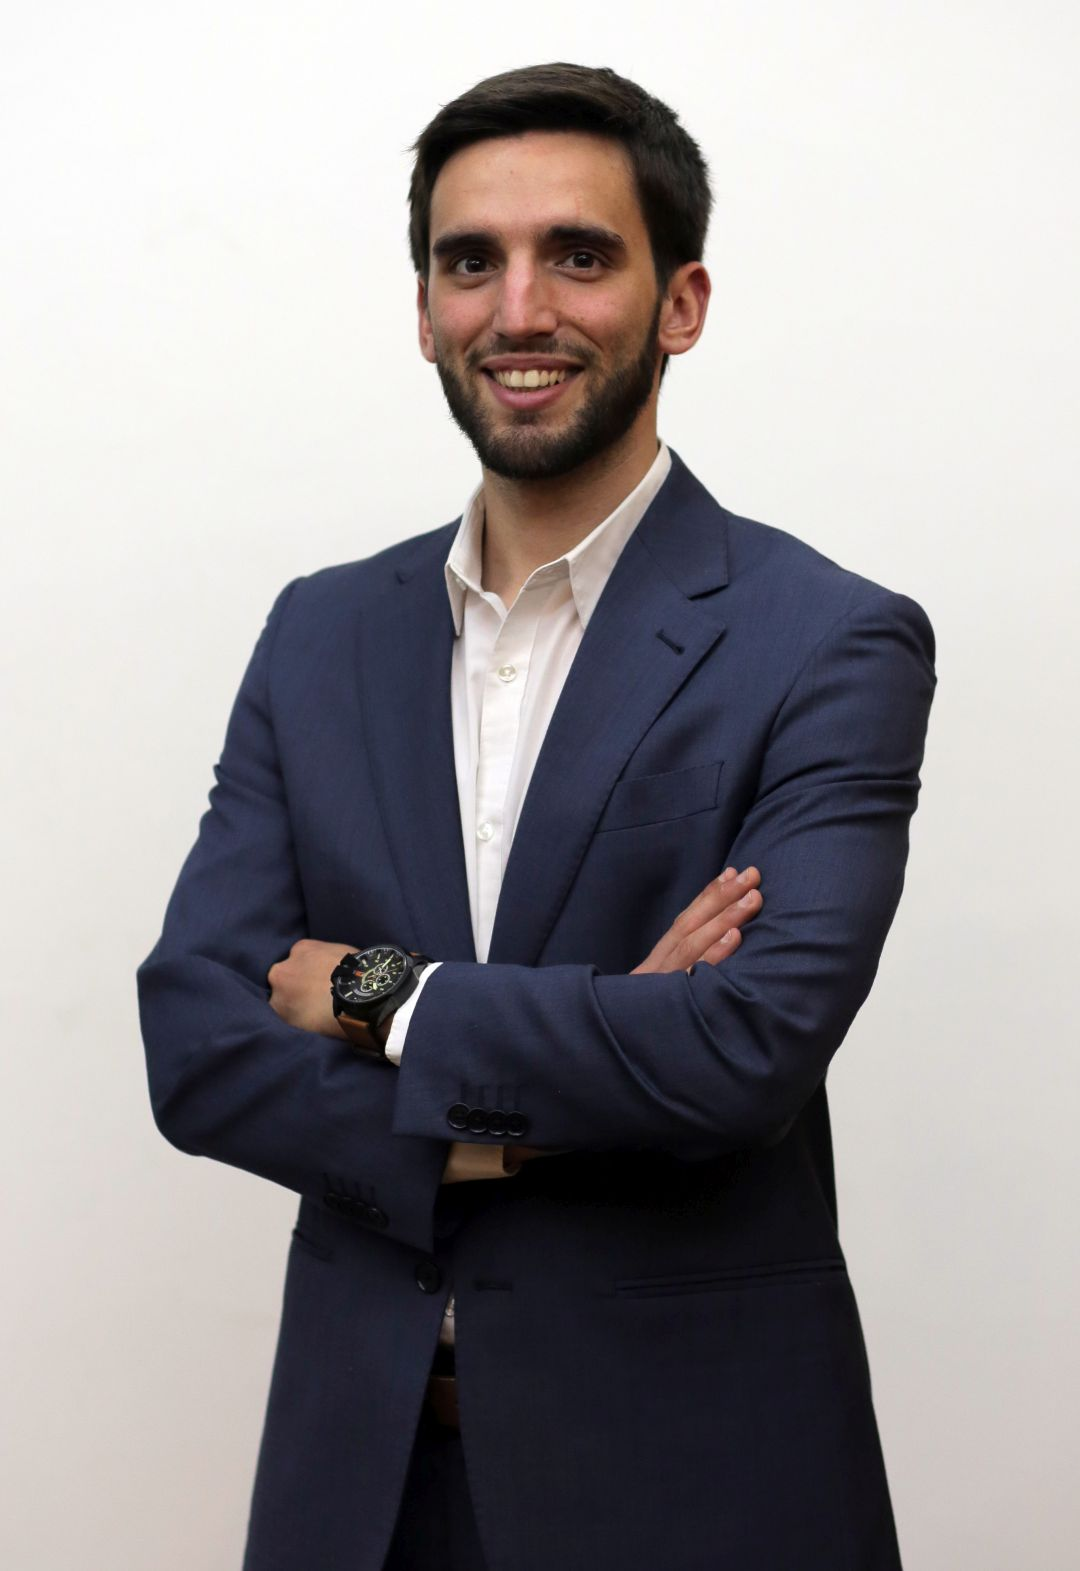 Gustavo Barros Pereira